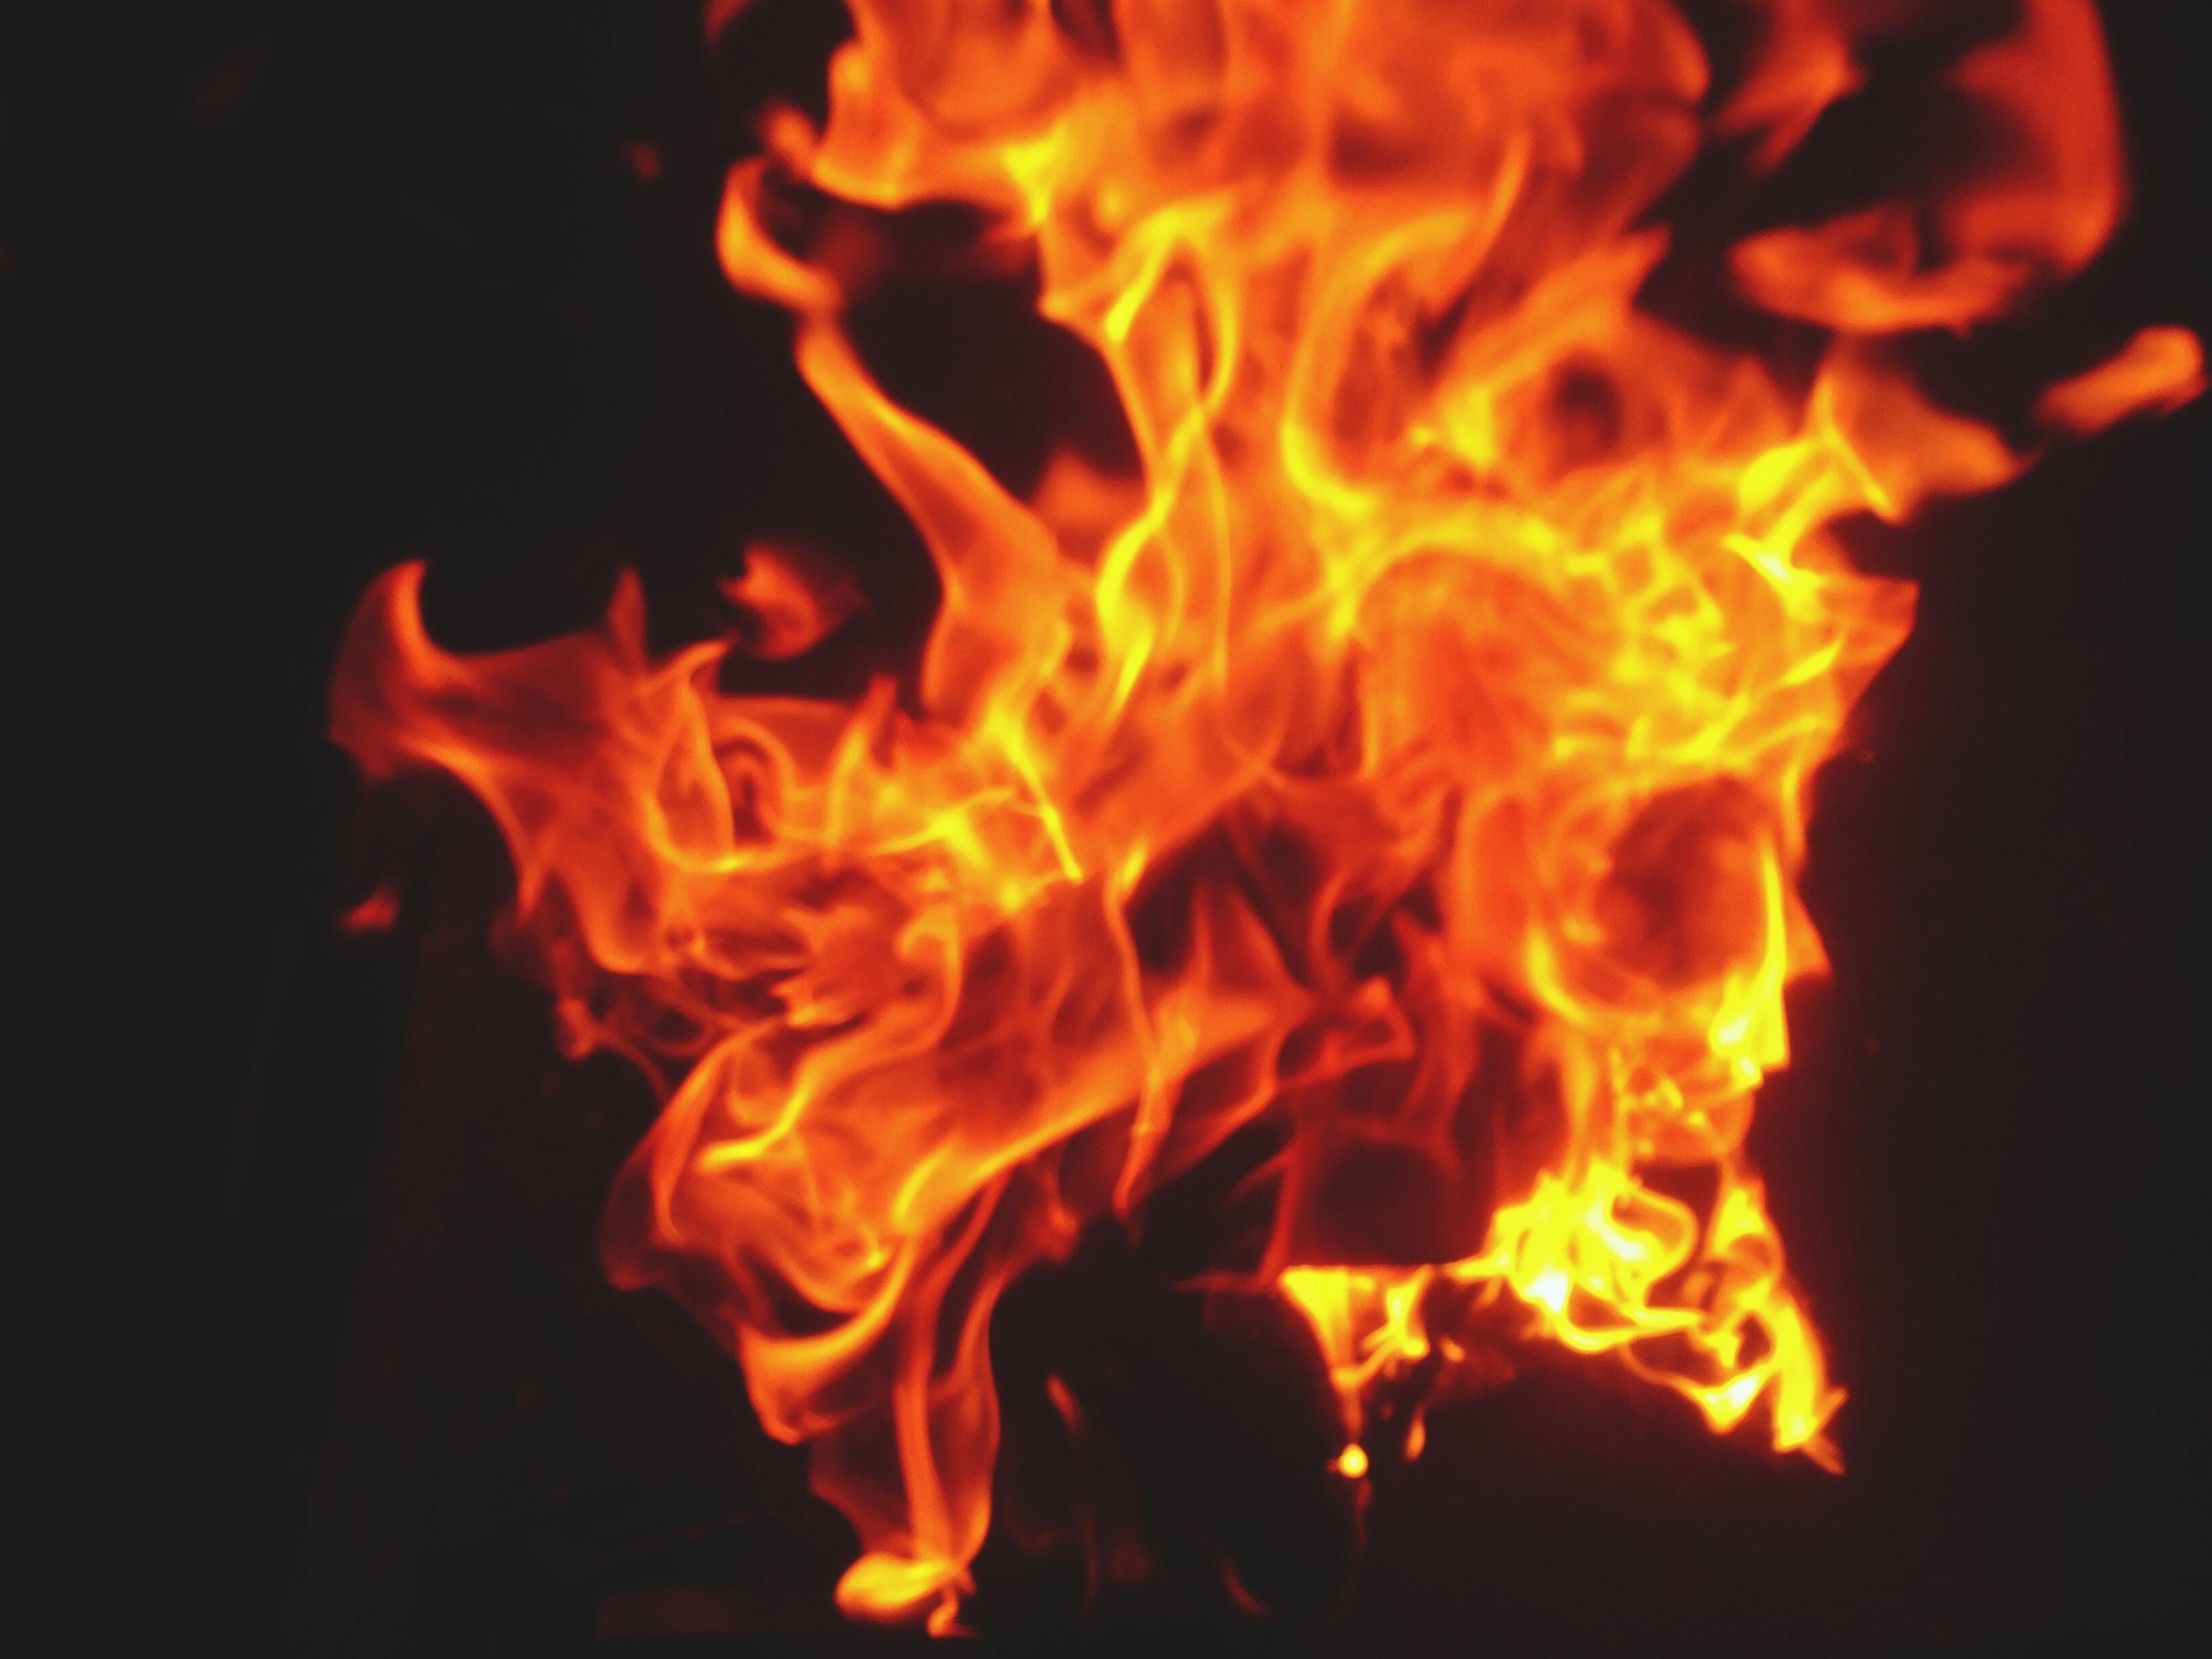 burning, flame, heat - temperature, fire - natural phenomenon, bonfire, glowing, night, orange color, campfire, firewood, fire, close-up, heat, motion, dark, yellow, no people, light - natural phenomenon, outdoors, long exposure